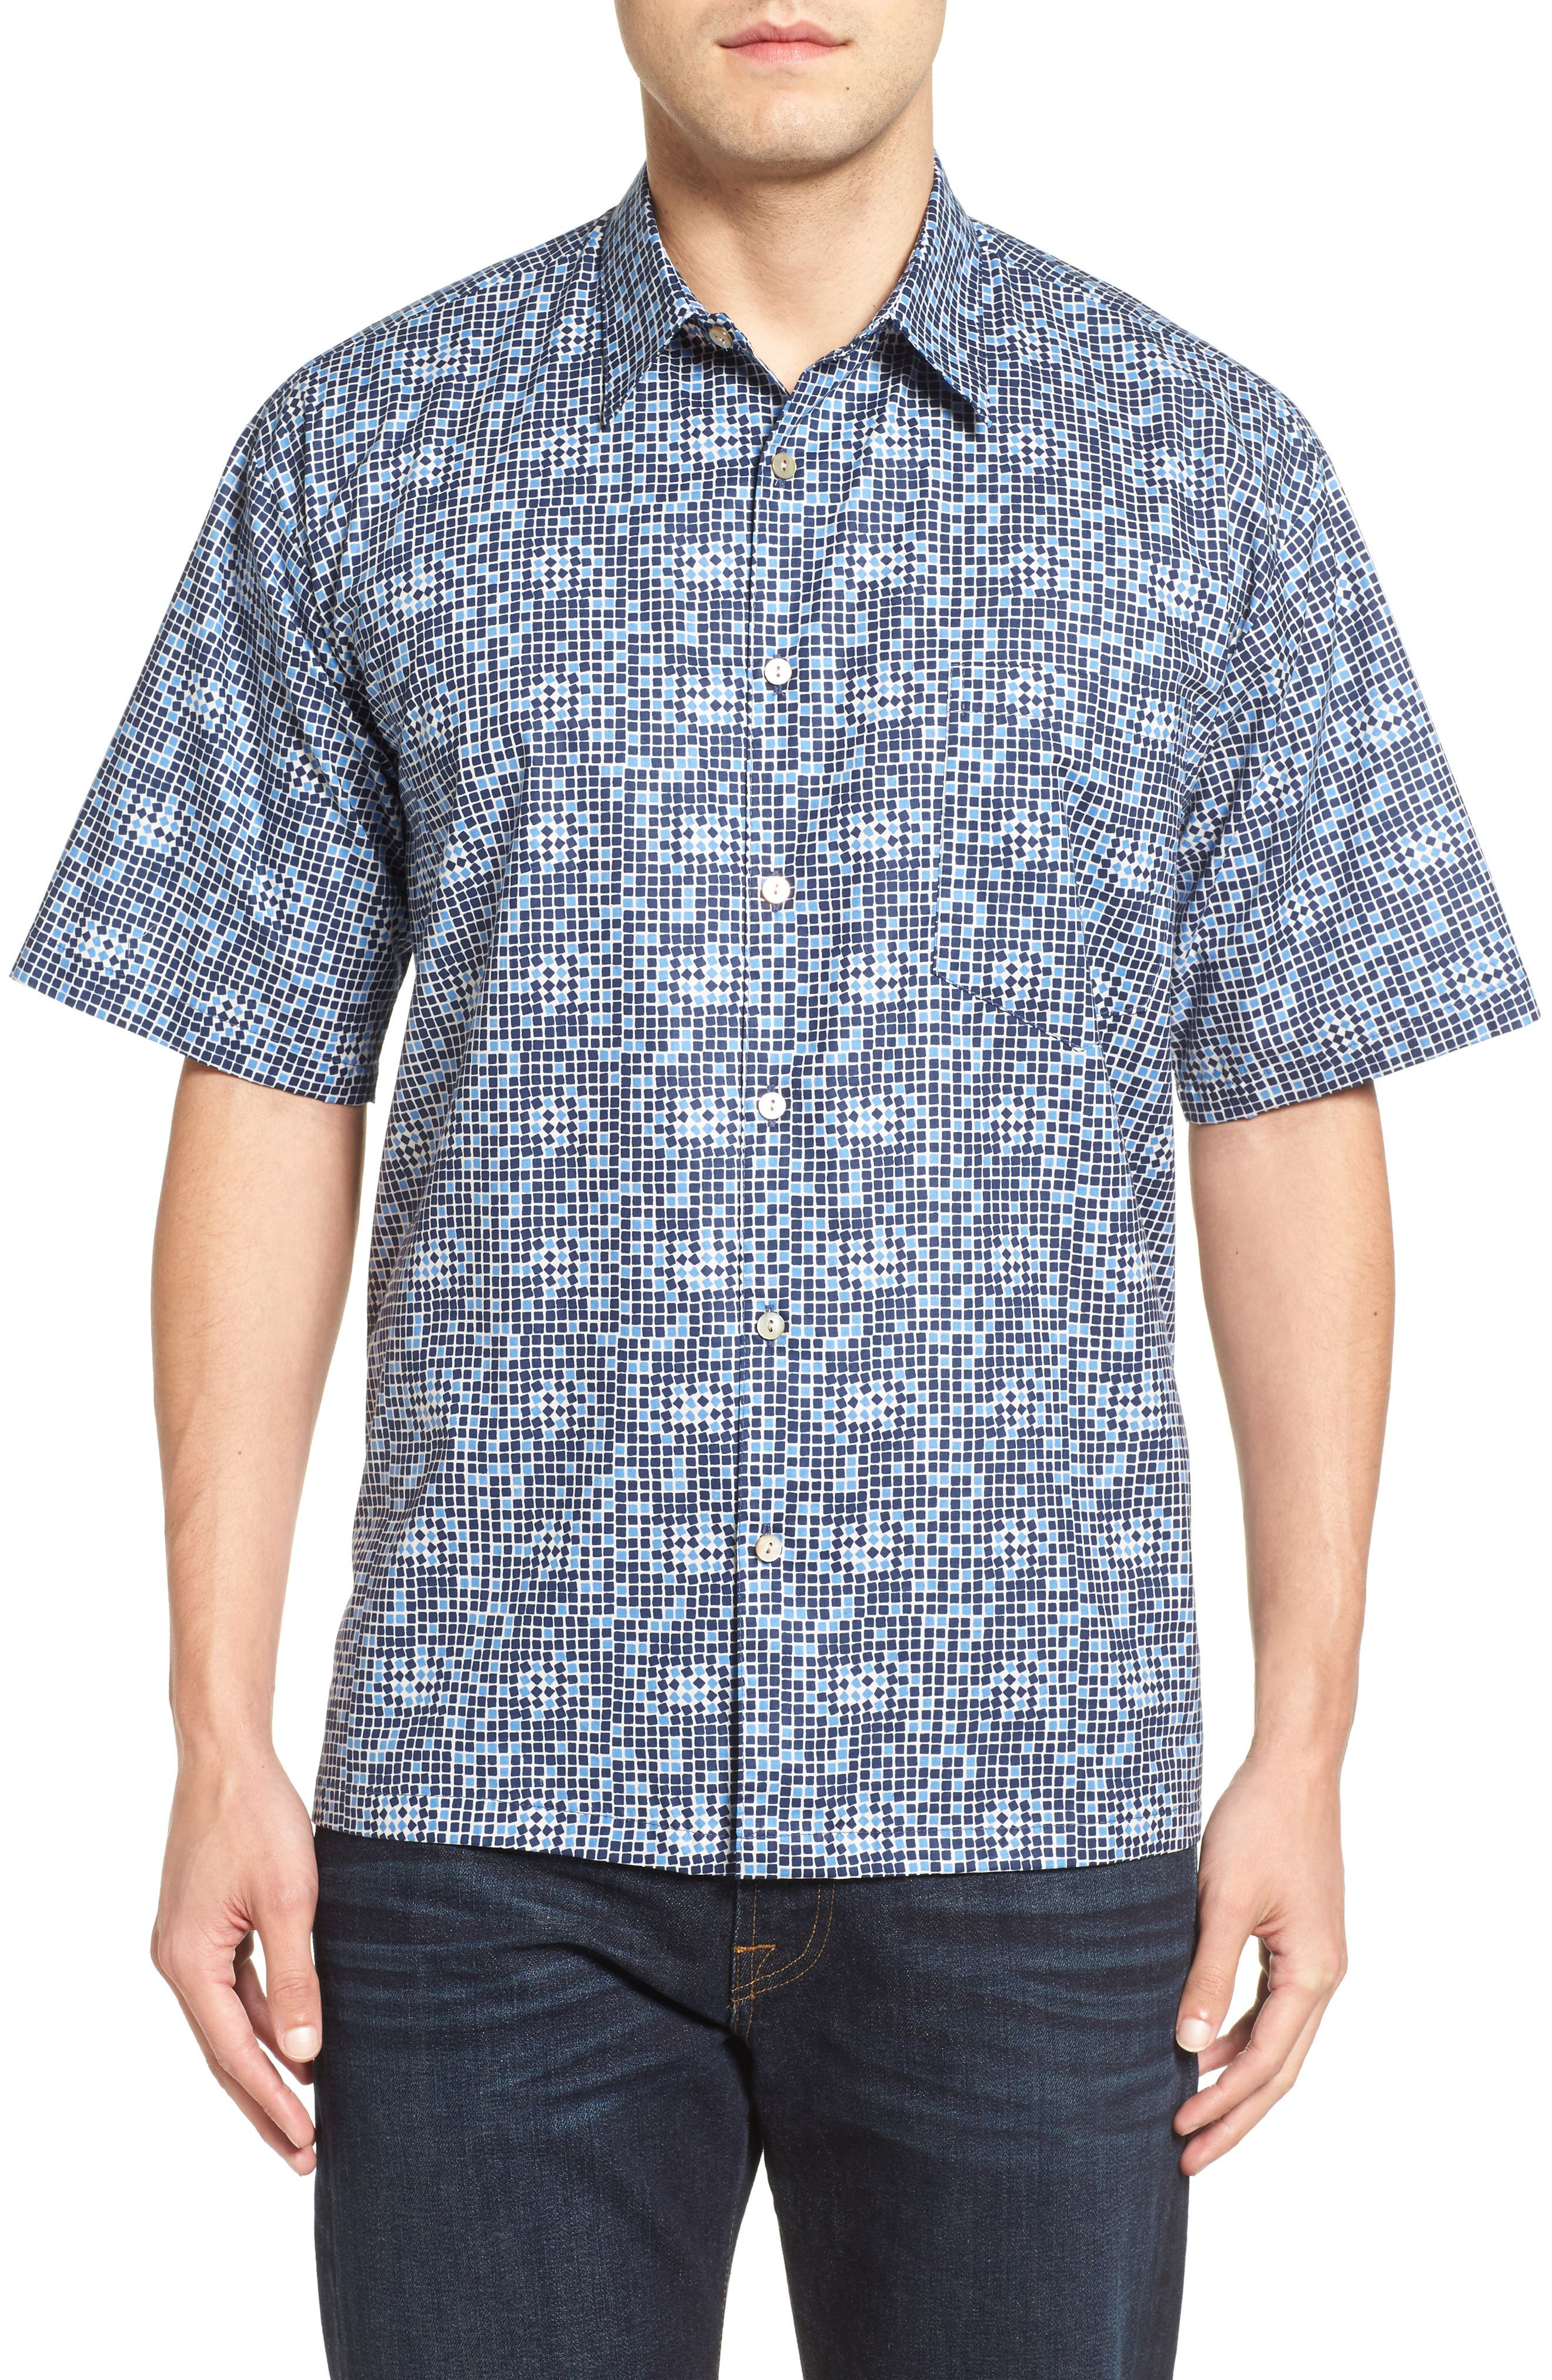 Tori Richard Tessellation Short Sleeve Classic Fit Sport Shirt